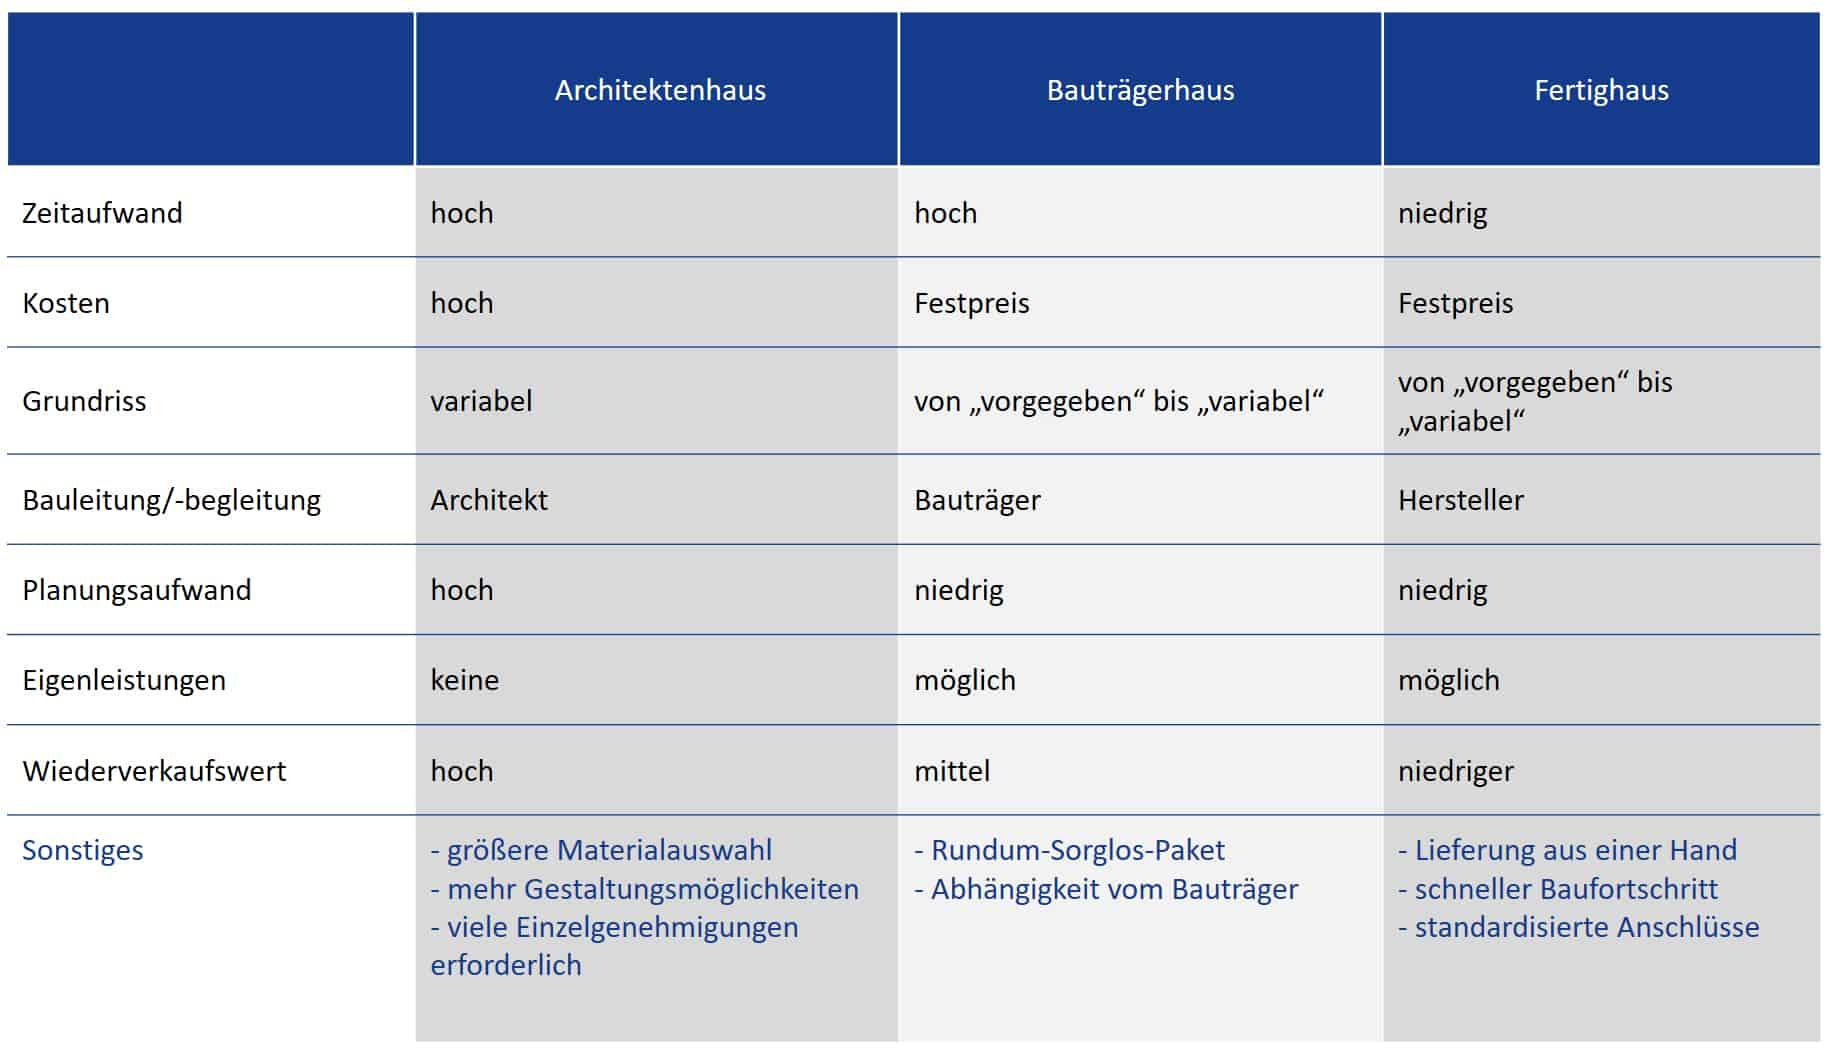 Vergleich: Architektenhaus, Bauträgerhaus, Fertighaus